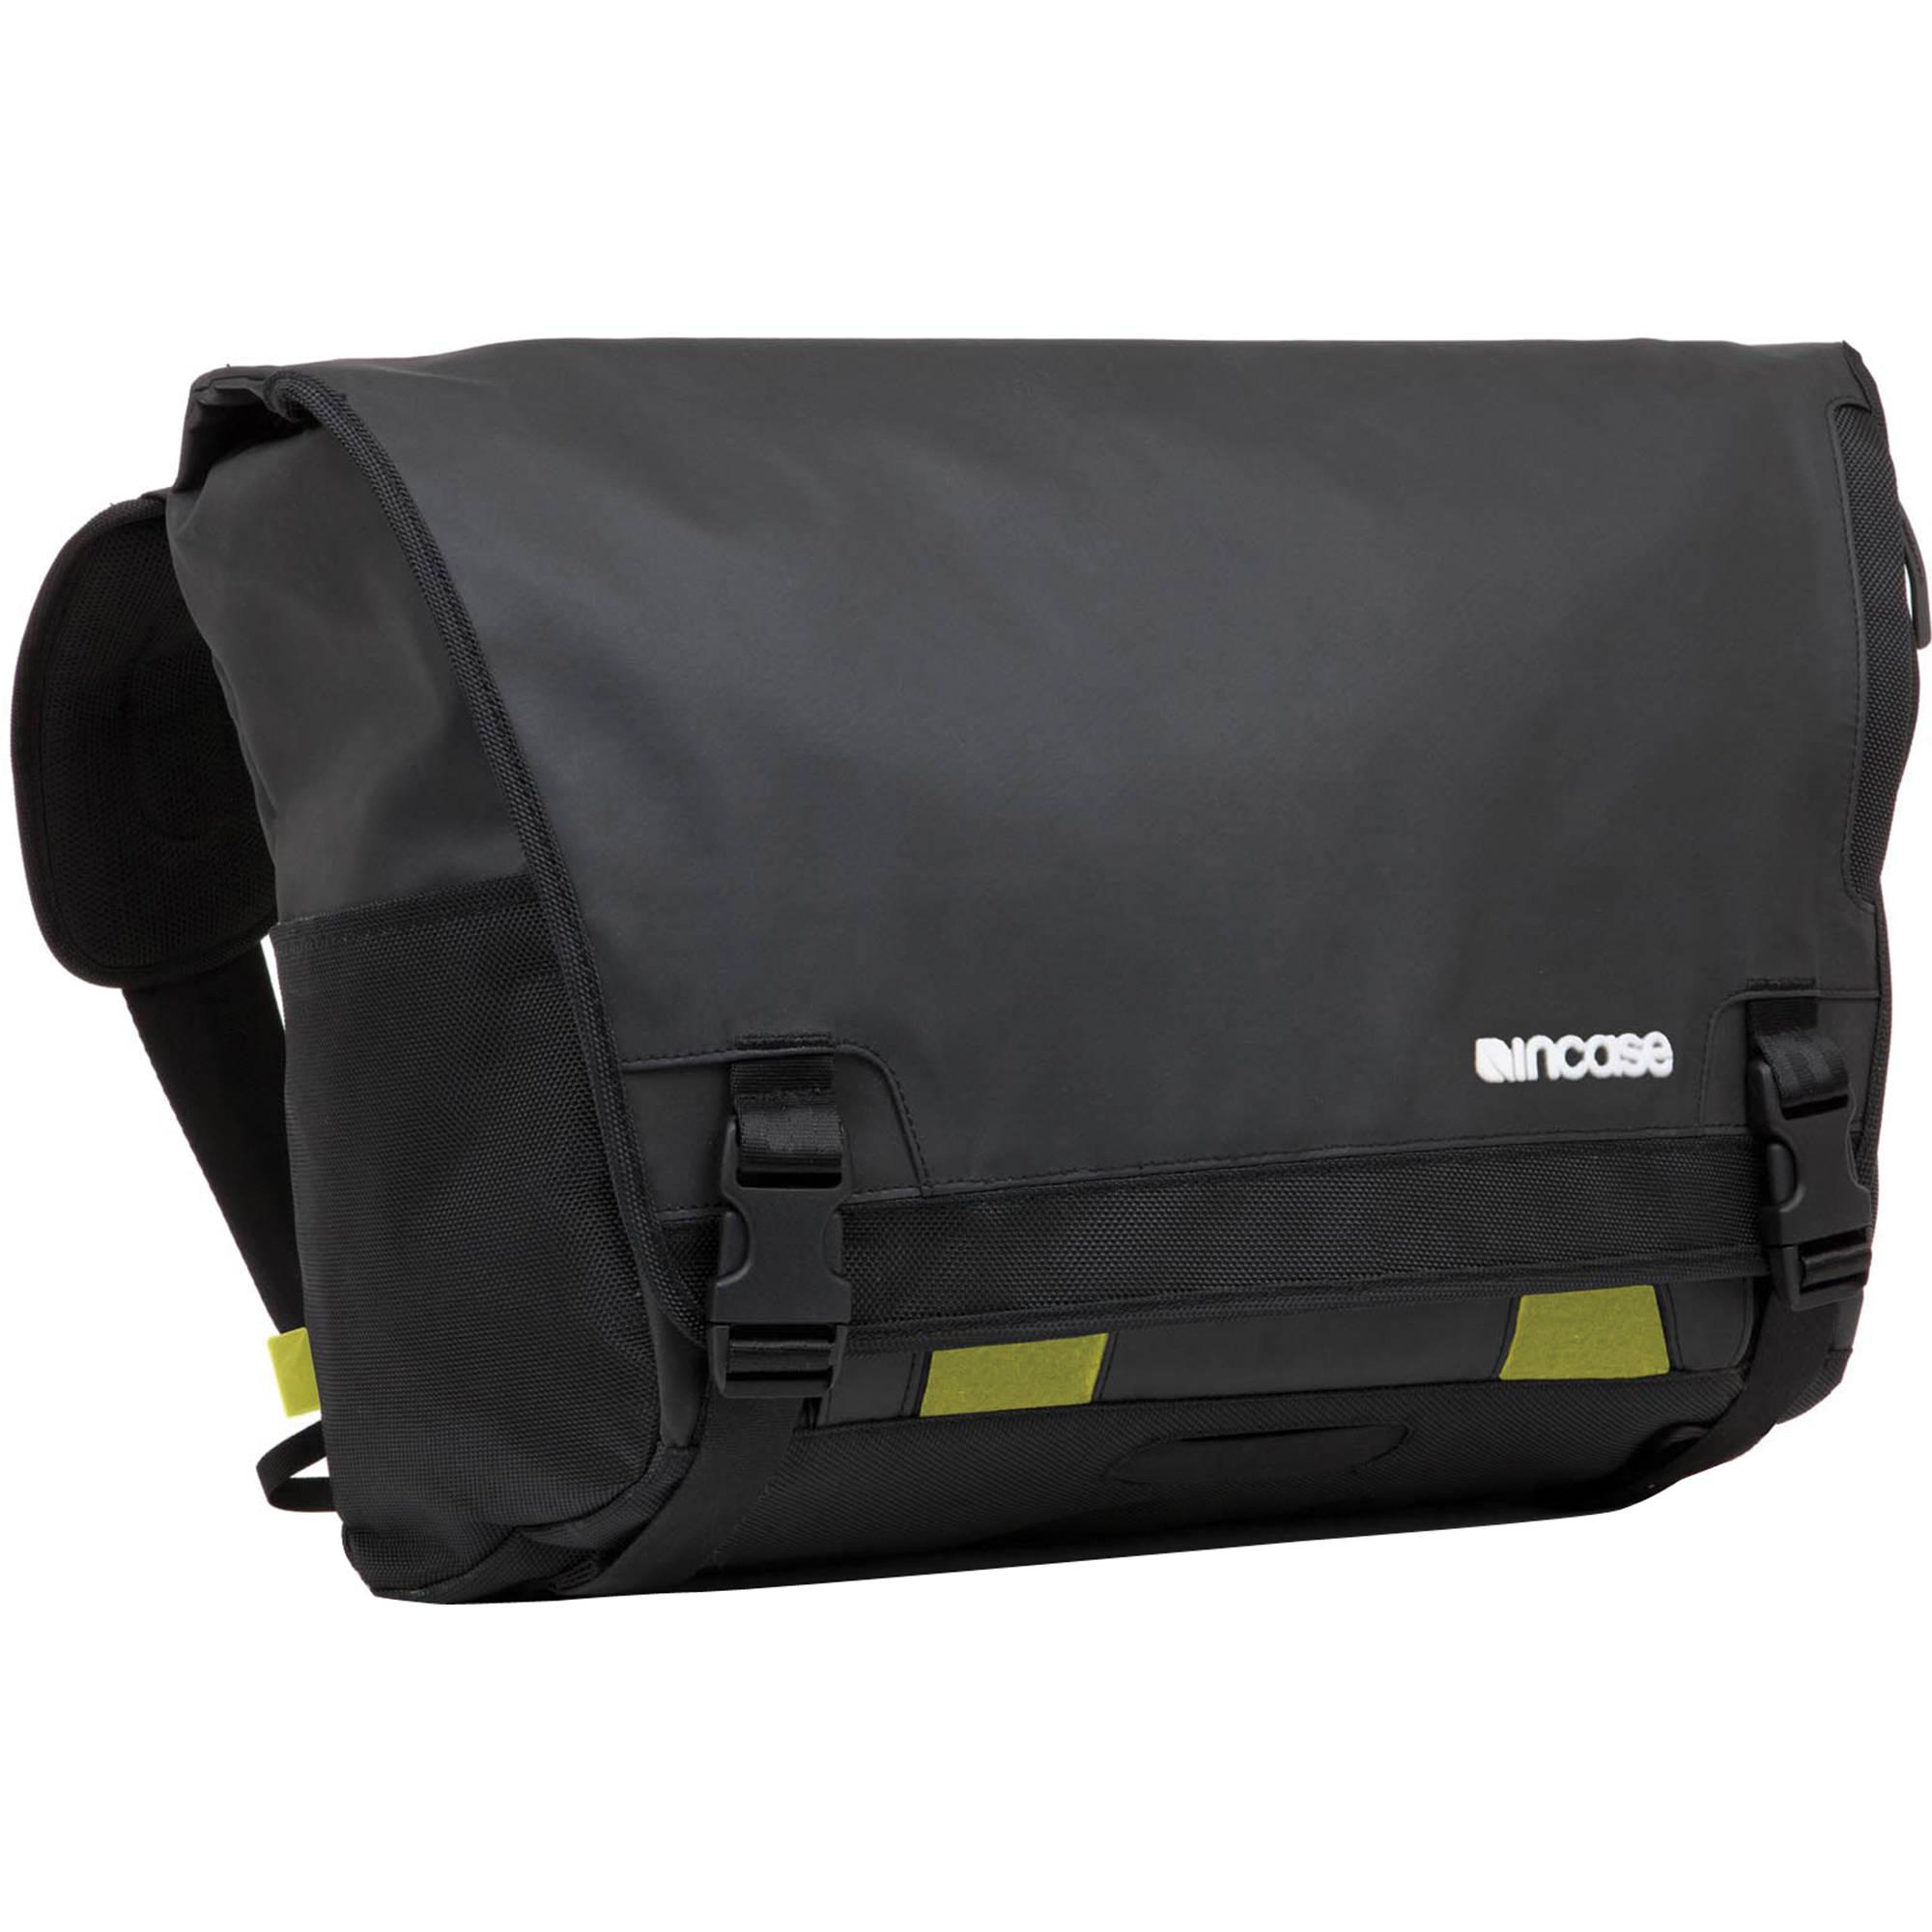 Incase Designs Corp Range Messenger Bag for 15